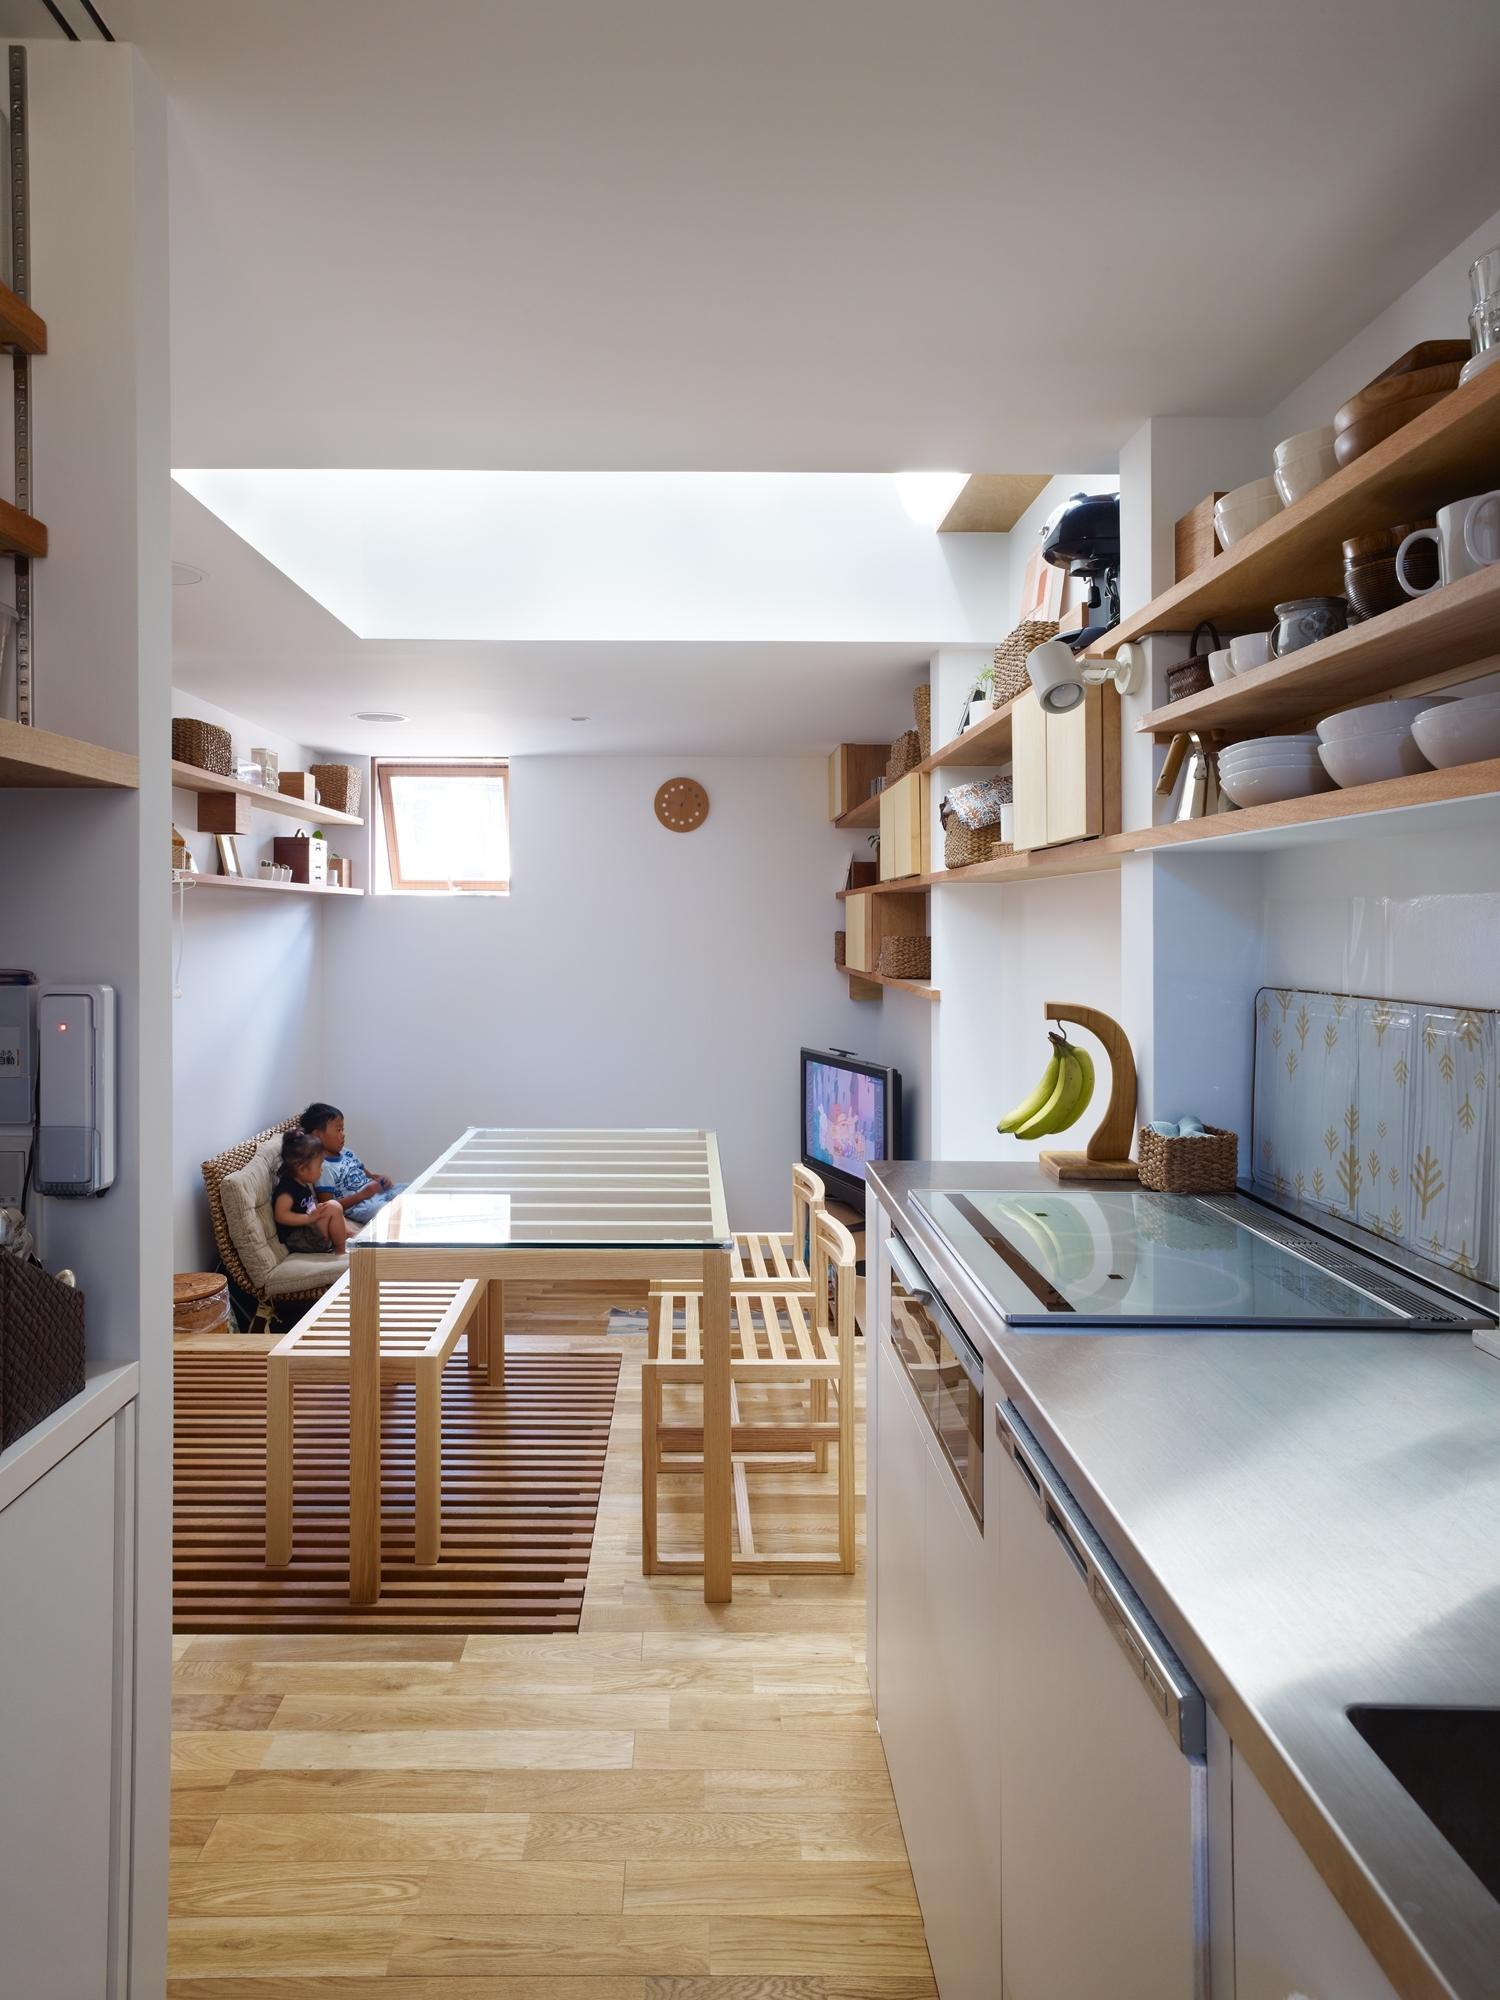 5144f28bb3fc4b88c6000083_house-in-nada-fujiwarramuro-architects_oishi2165520001